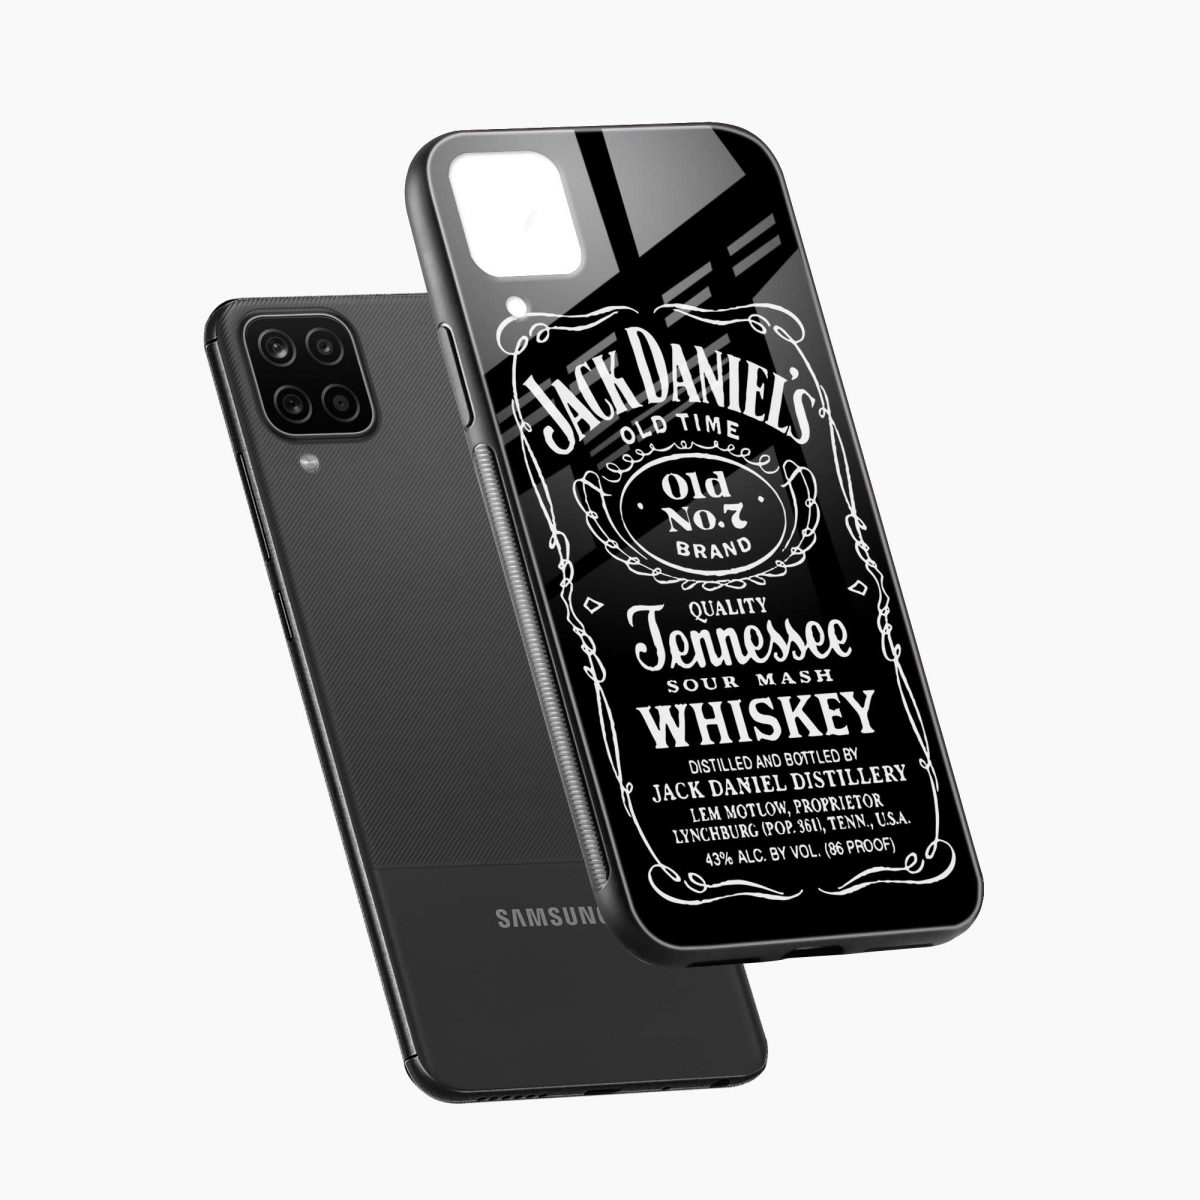 jack daniels whiskey diagonal view samsung galaxy a12 back cover